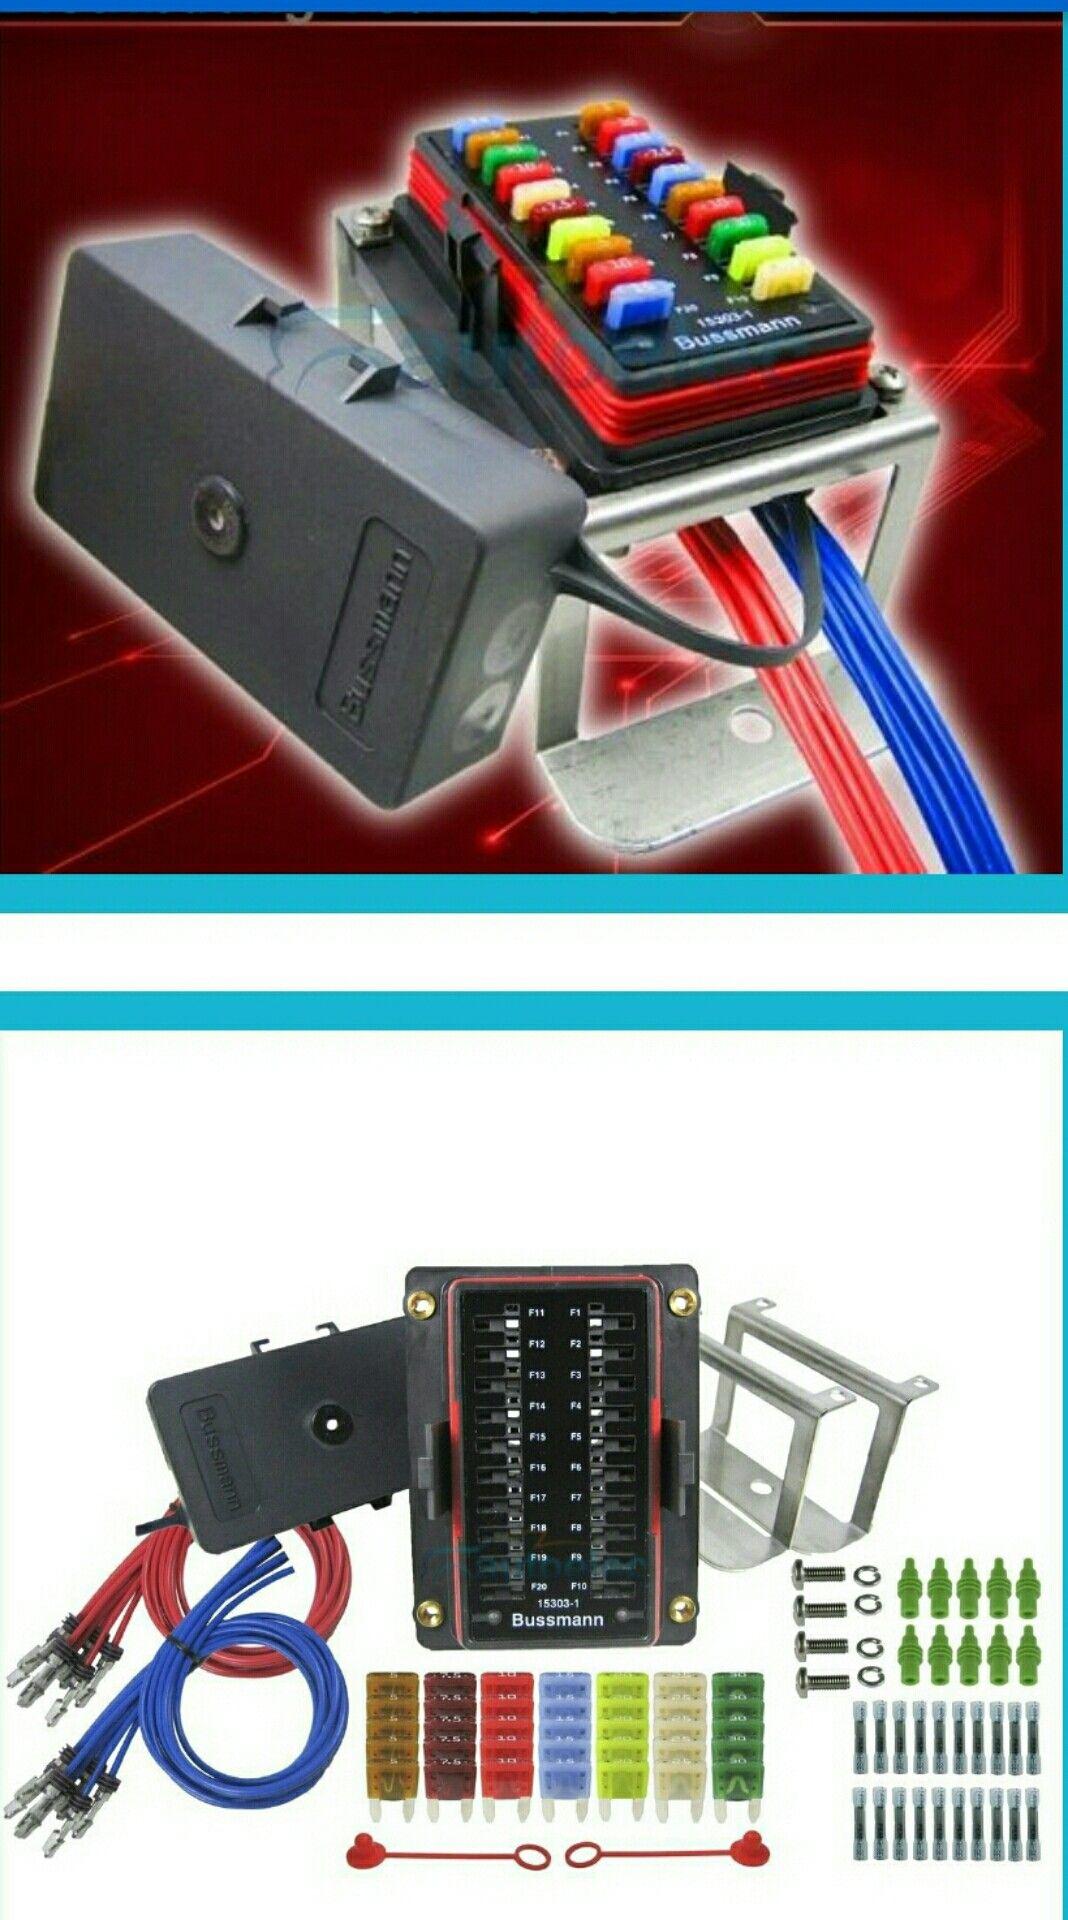 car audio bussmann 20 mini fuse holder ip66 diy electronics electronics projects k5 blazer ice [ 1068 x 1920 Pixel ]